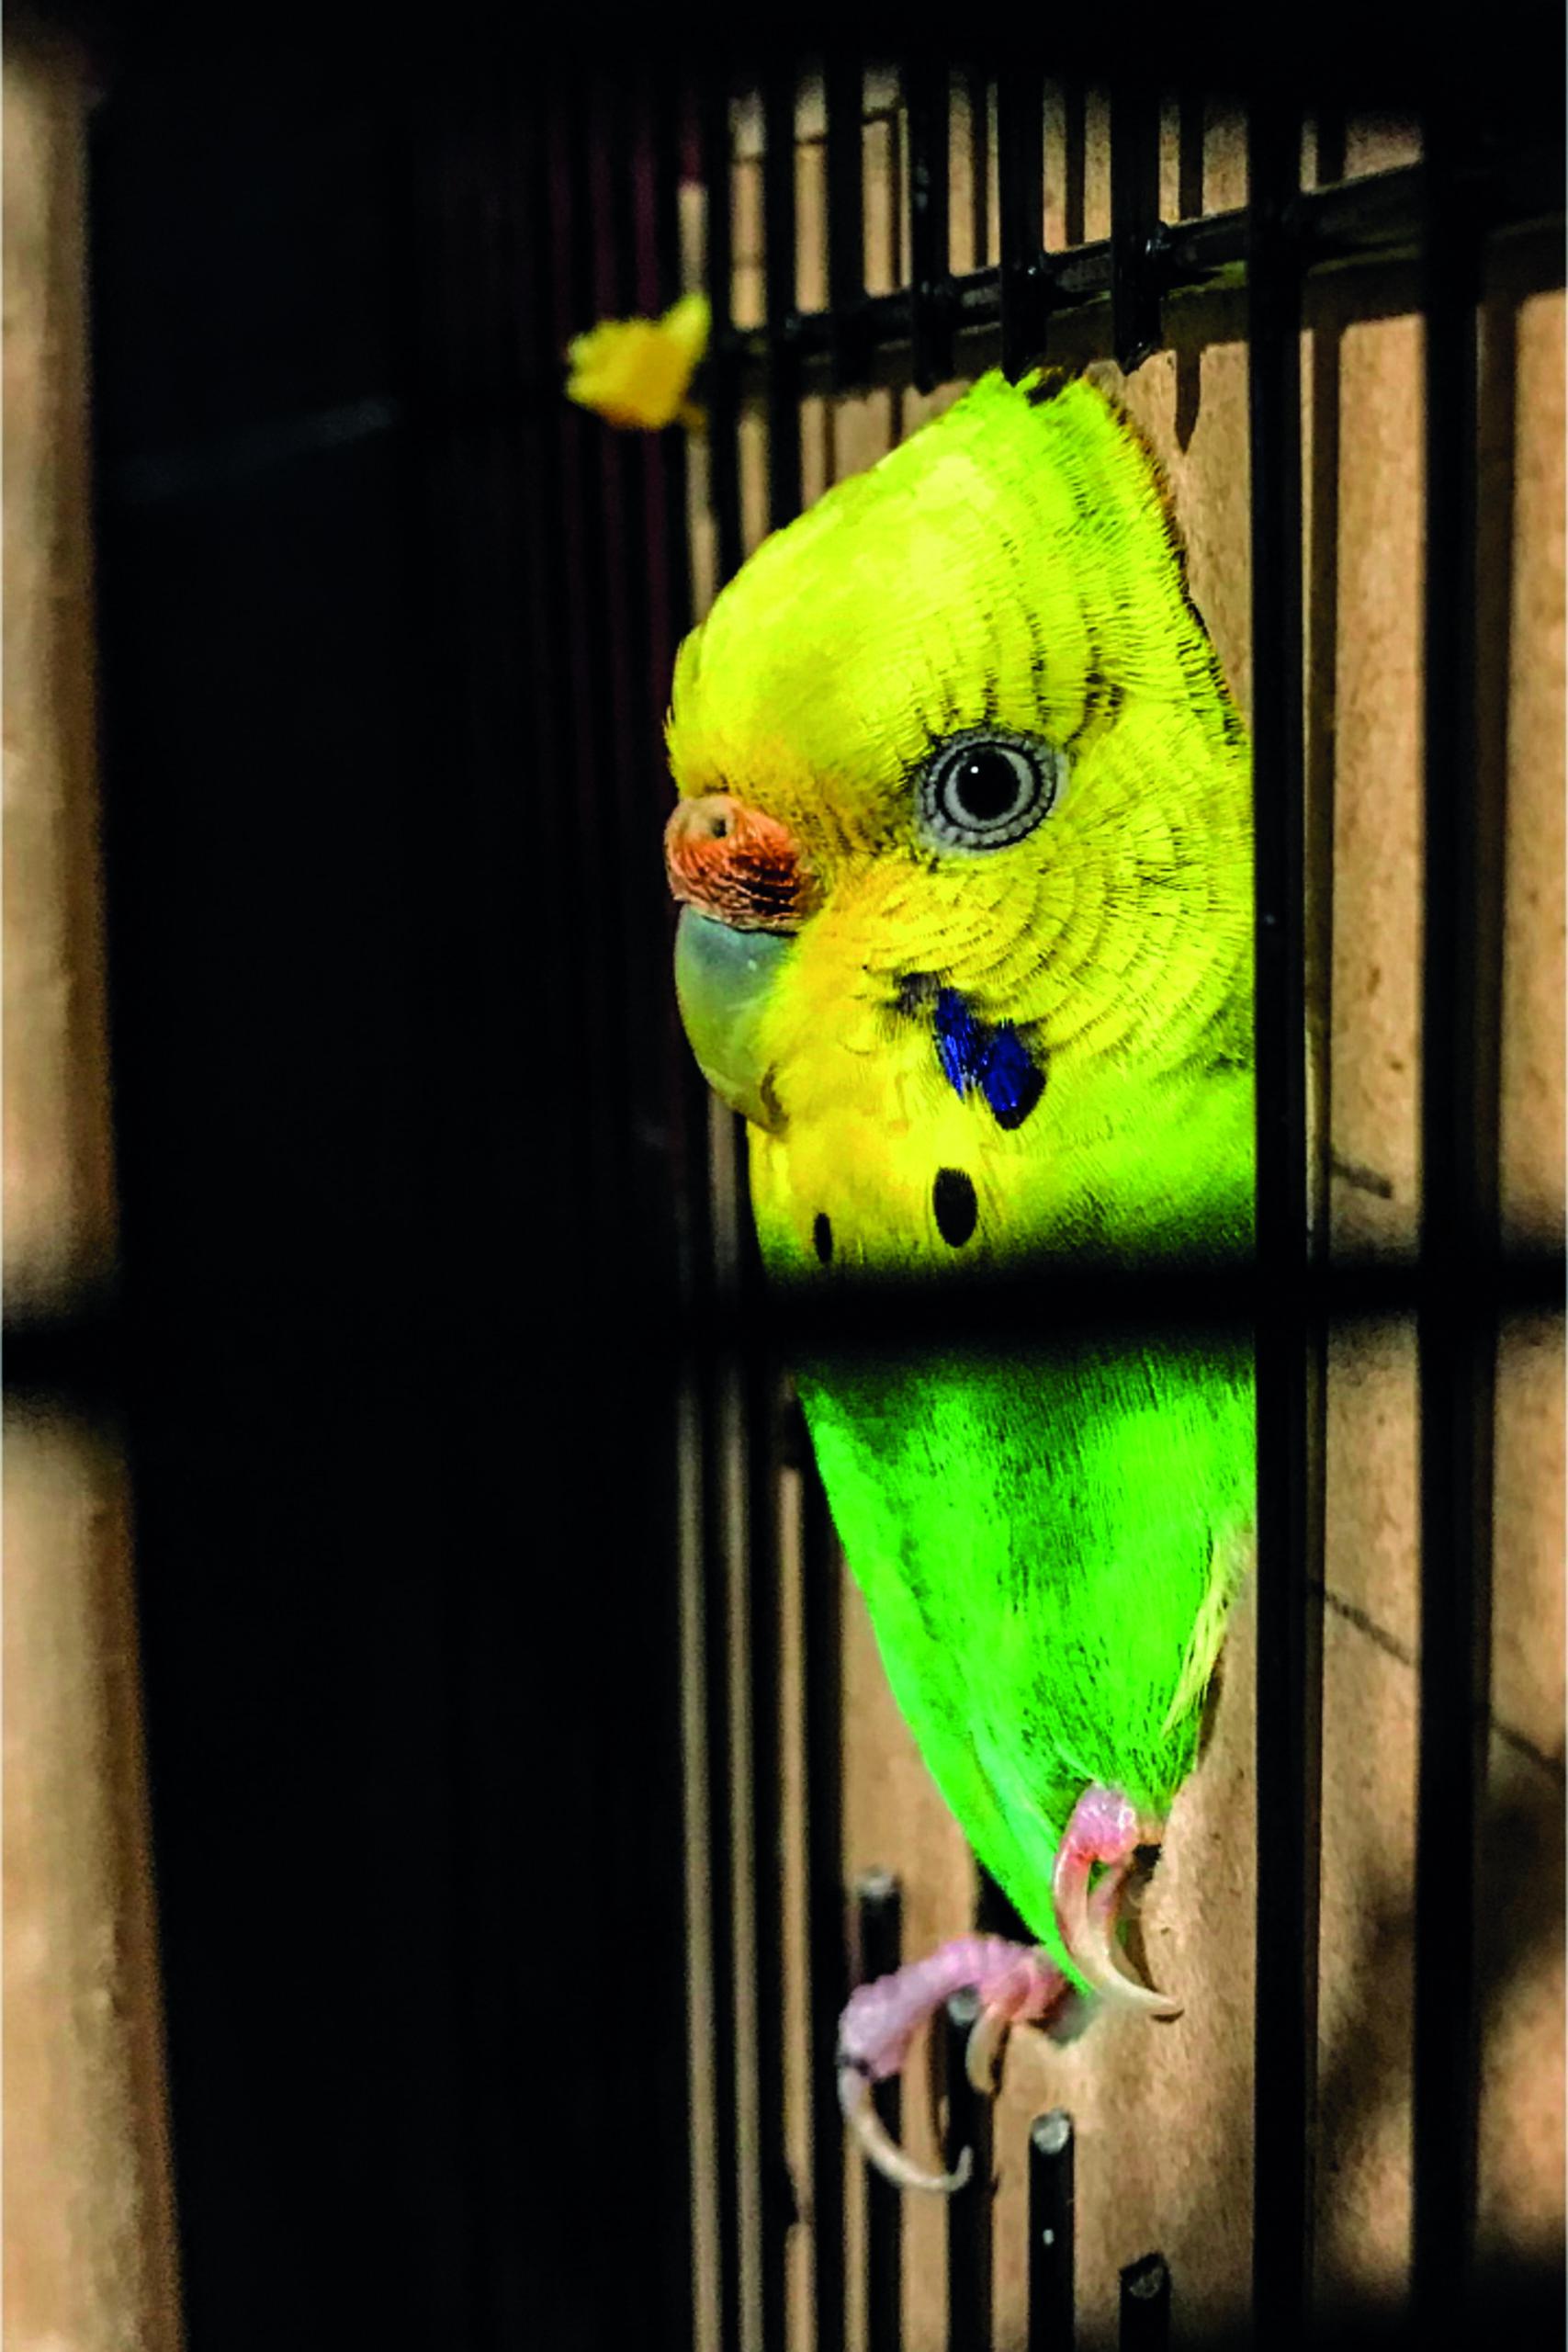 Pets Corner: Escaped Birds